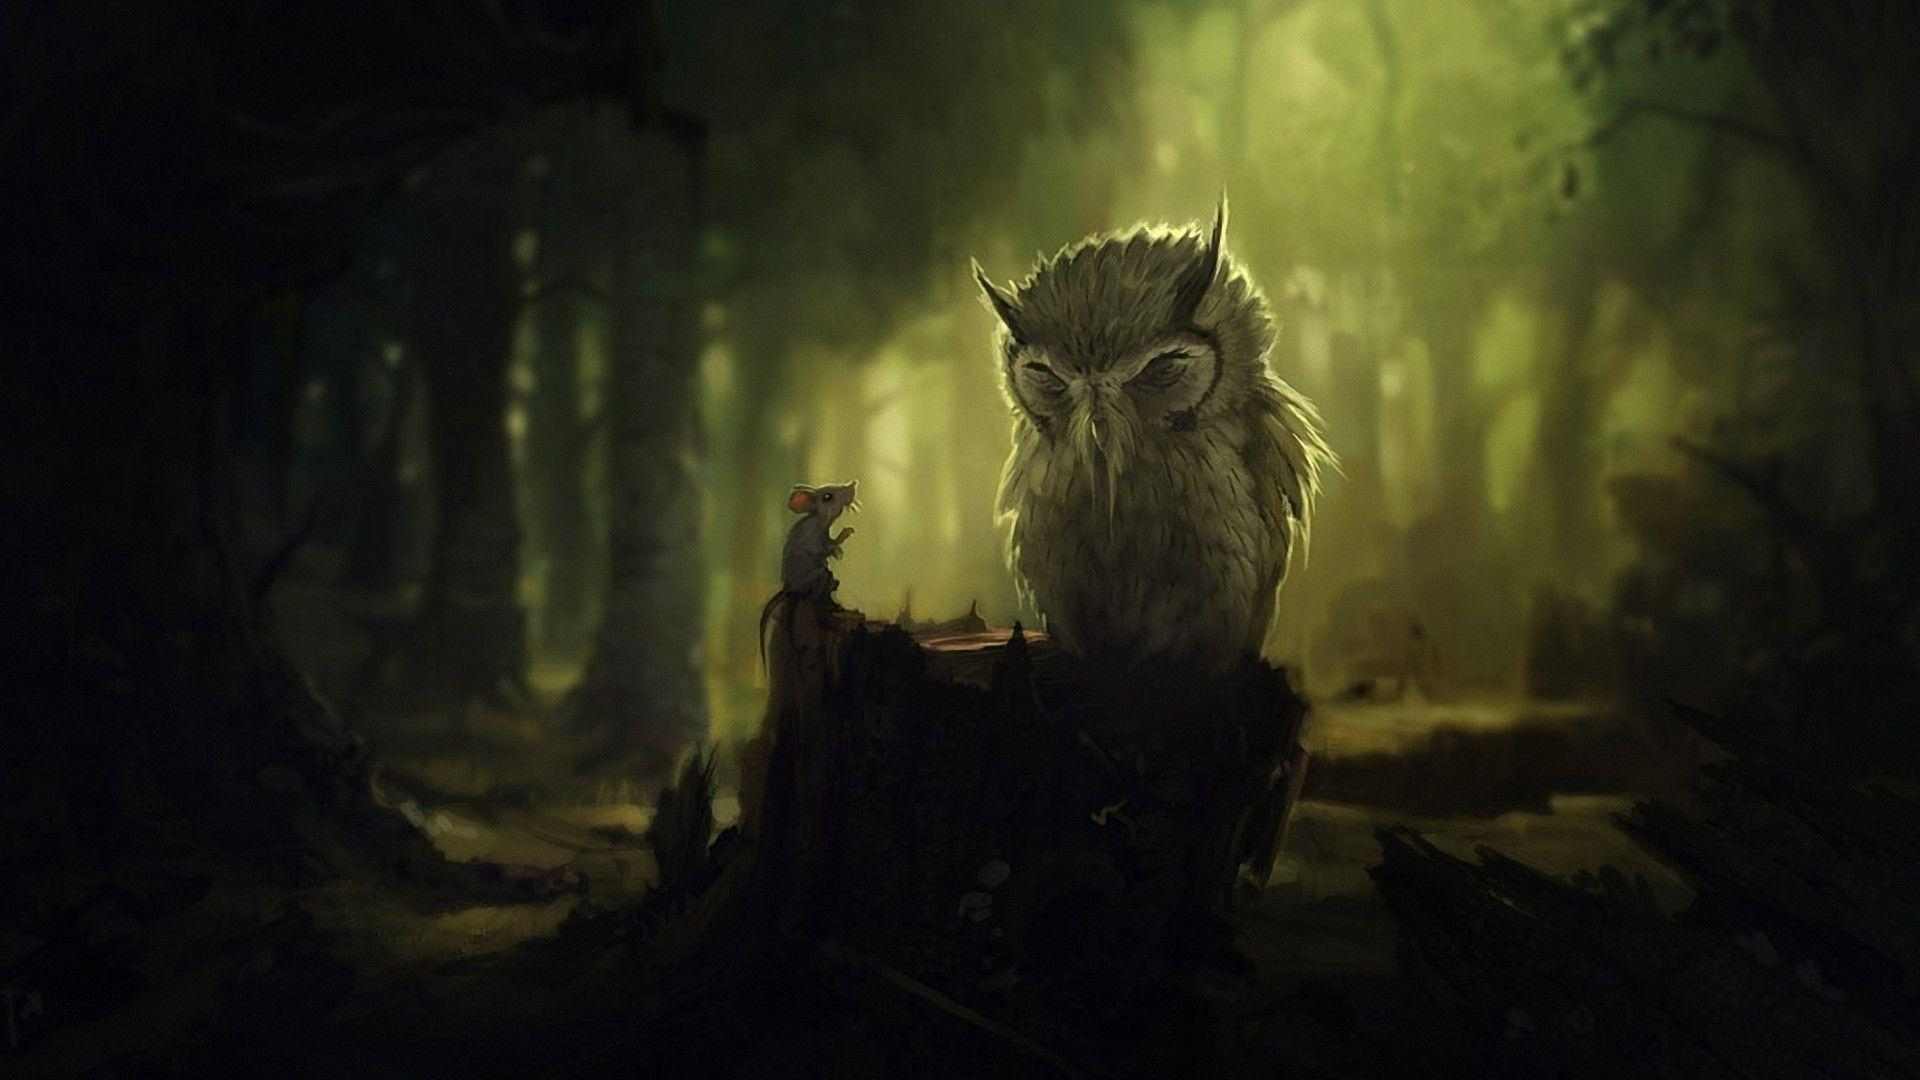 Animals Birds Owl Forest Wallpapers Desktop Phone Tablet